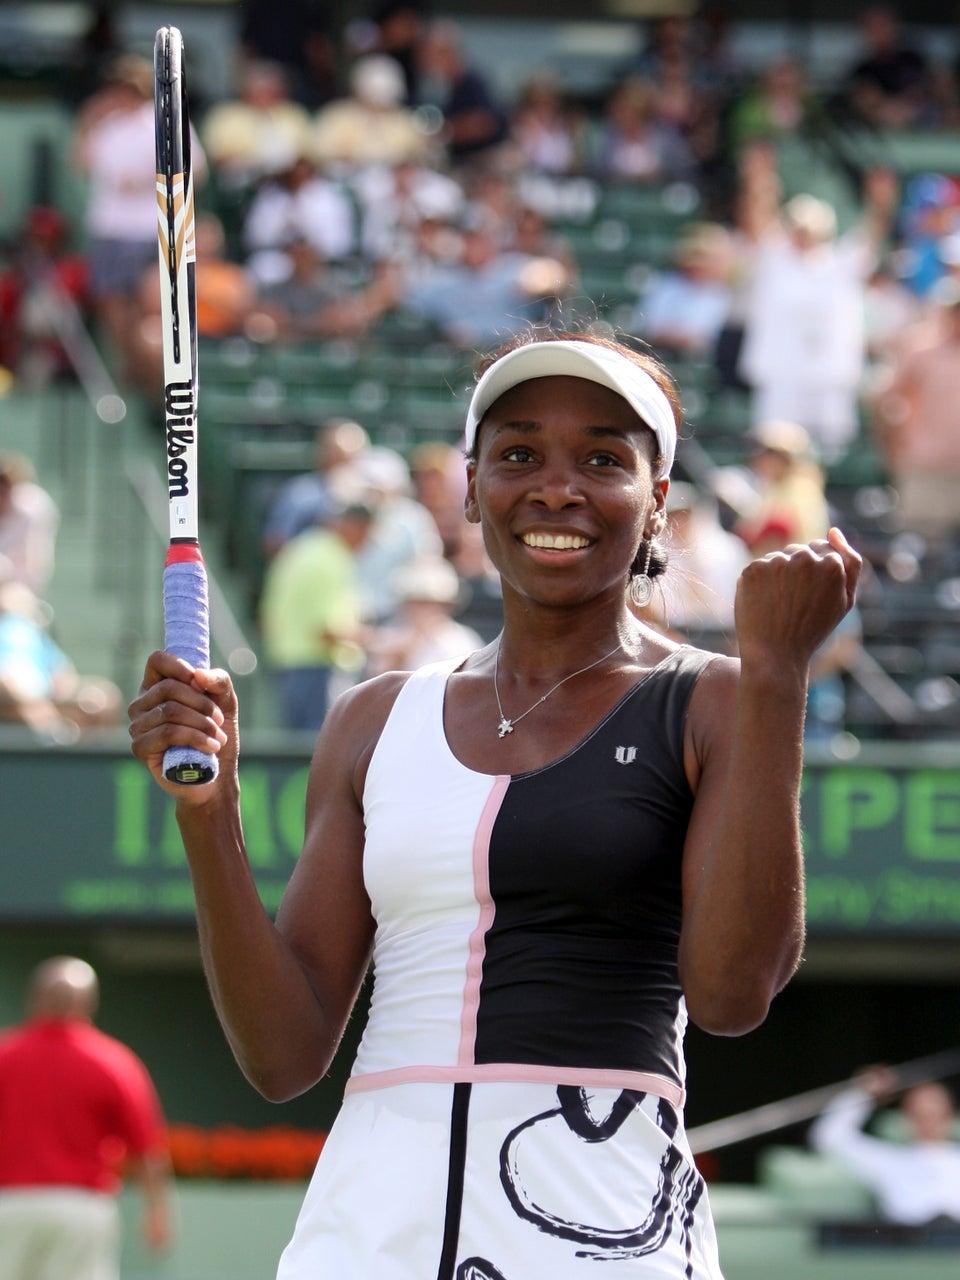 Coffee Talk: Venus Williams Returns to Tennis After Illness